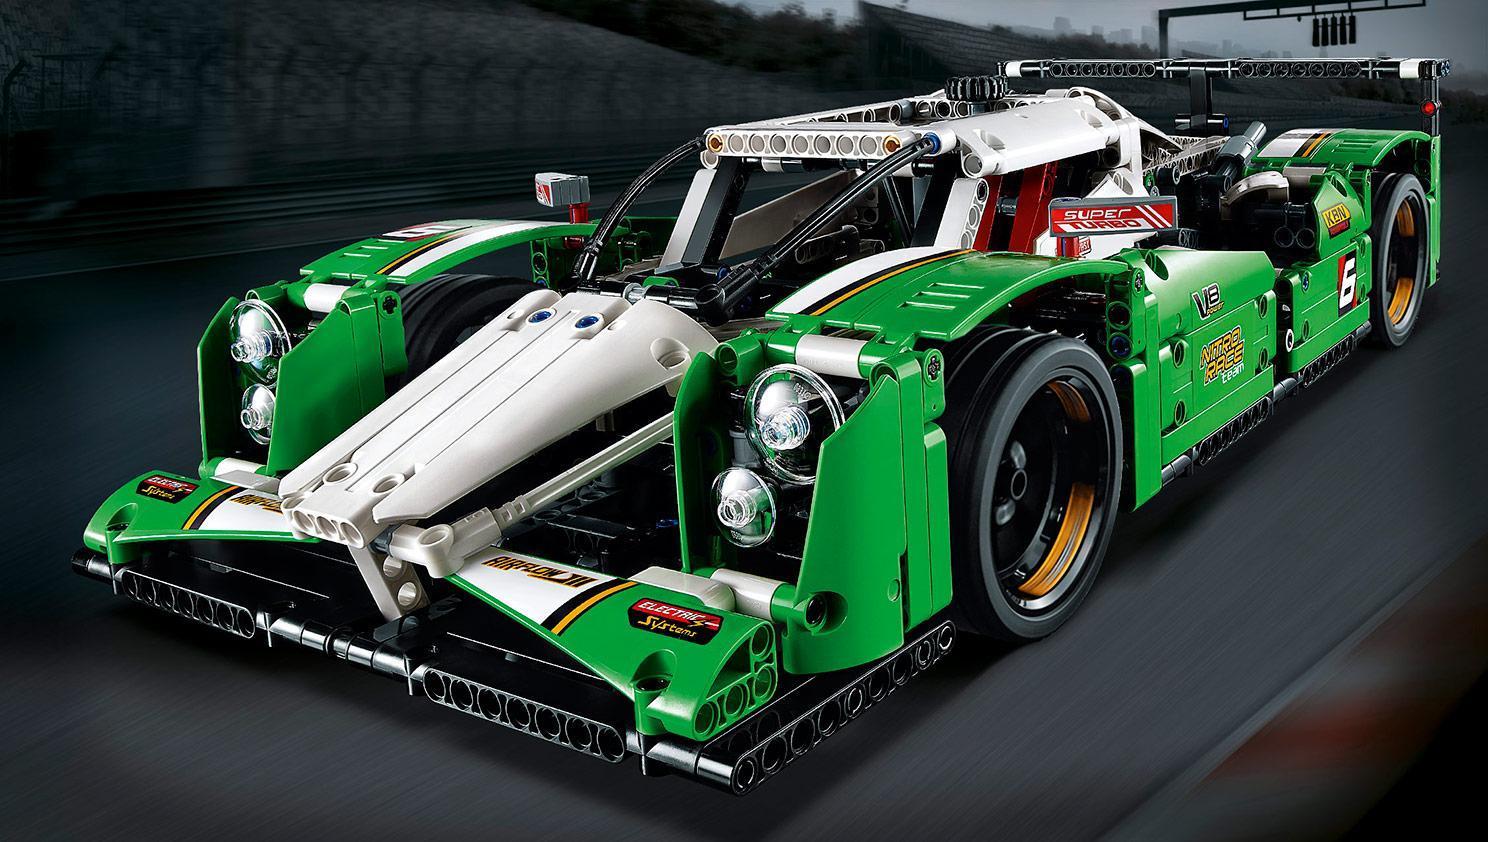 lego 42039 technic 24 hours race car multi coloured. Black Bedroom Furniture Sets. Home Design Ideas